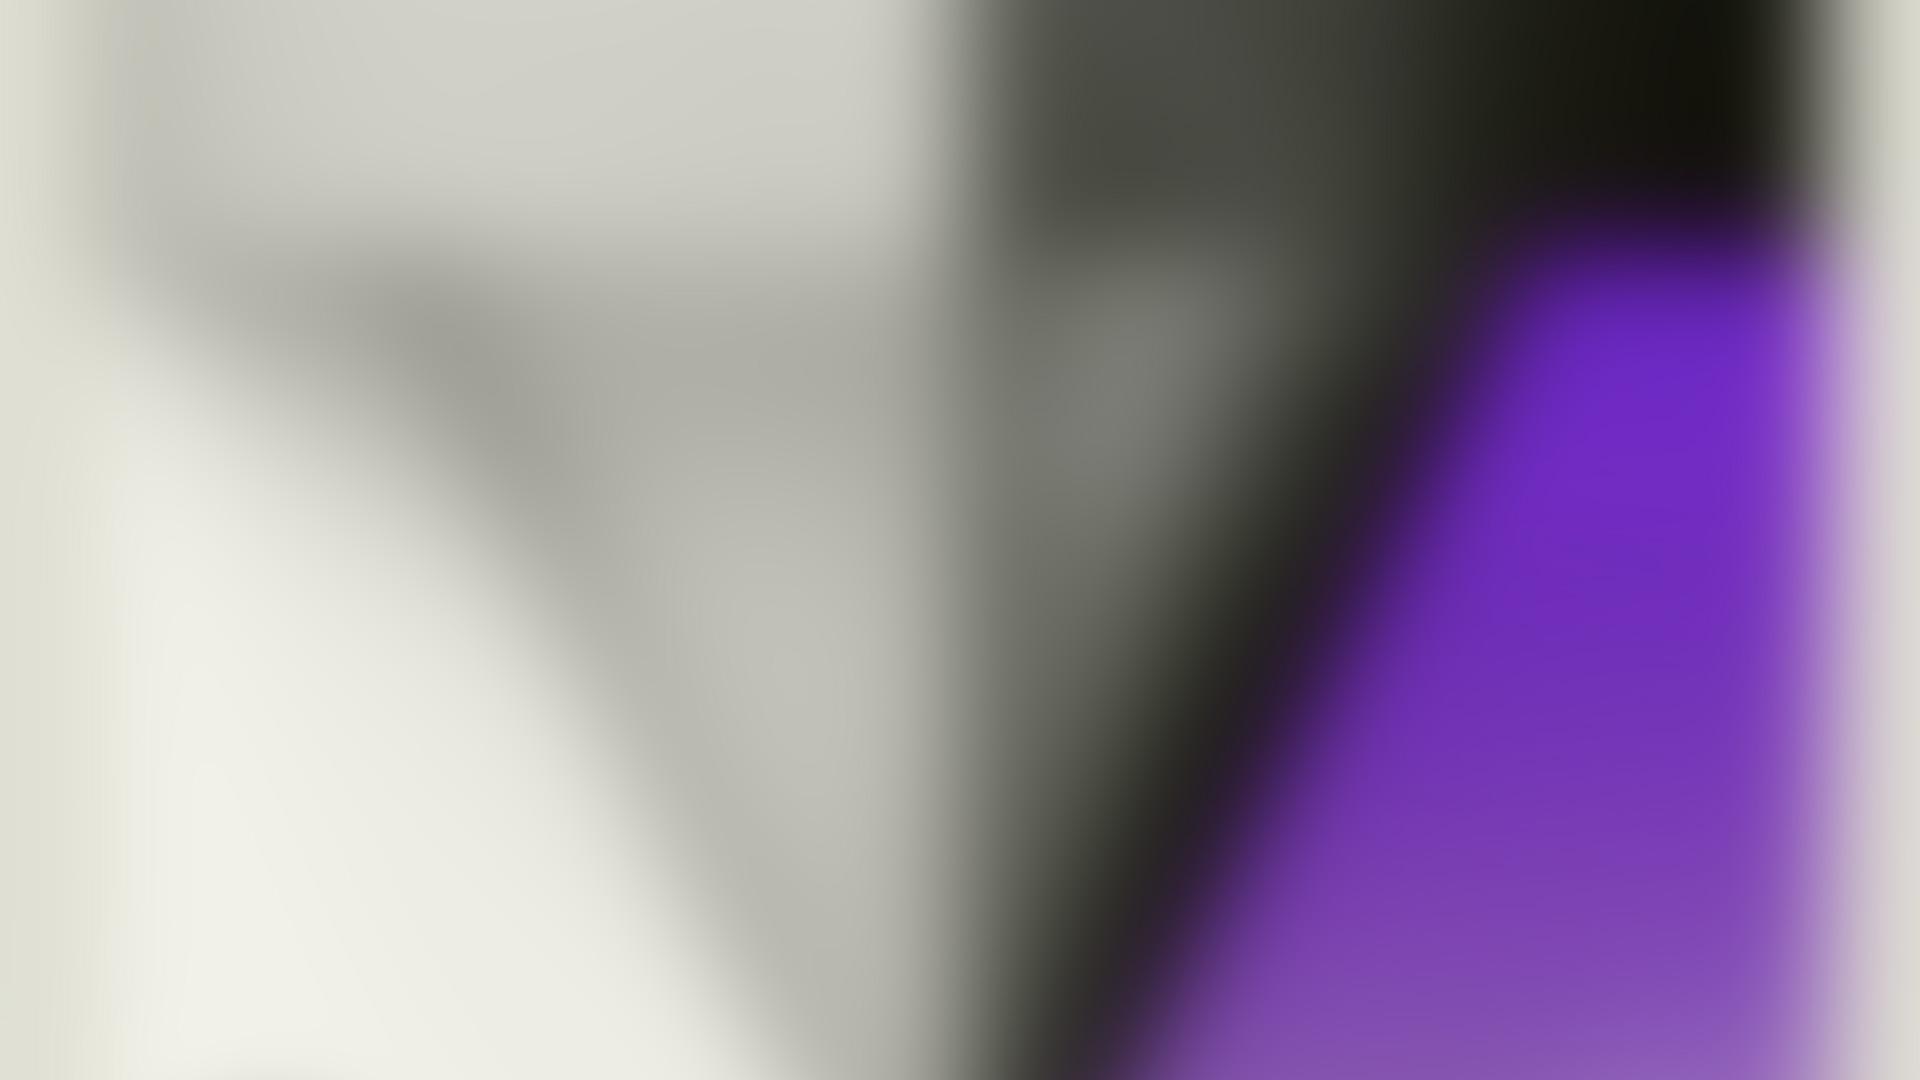 Mobilee200_DavidMayer_Phoebus_bg-blur